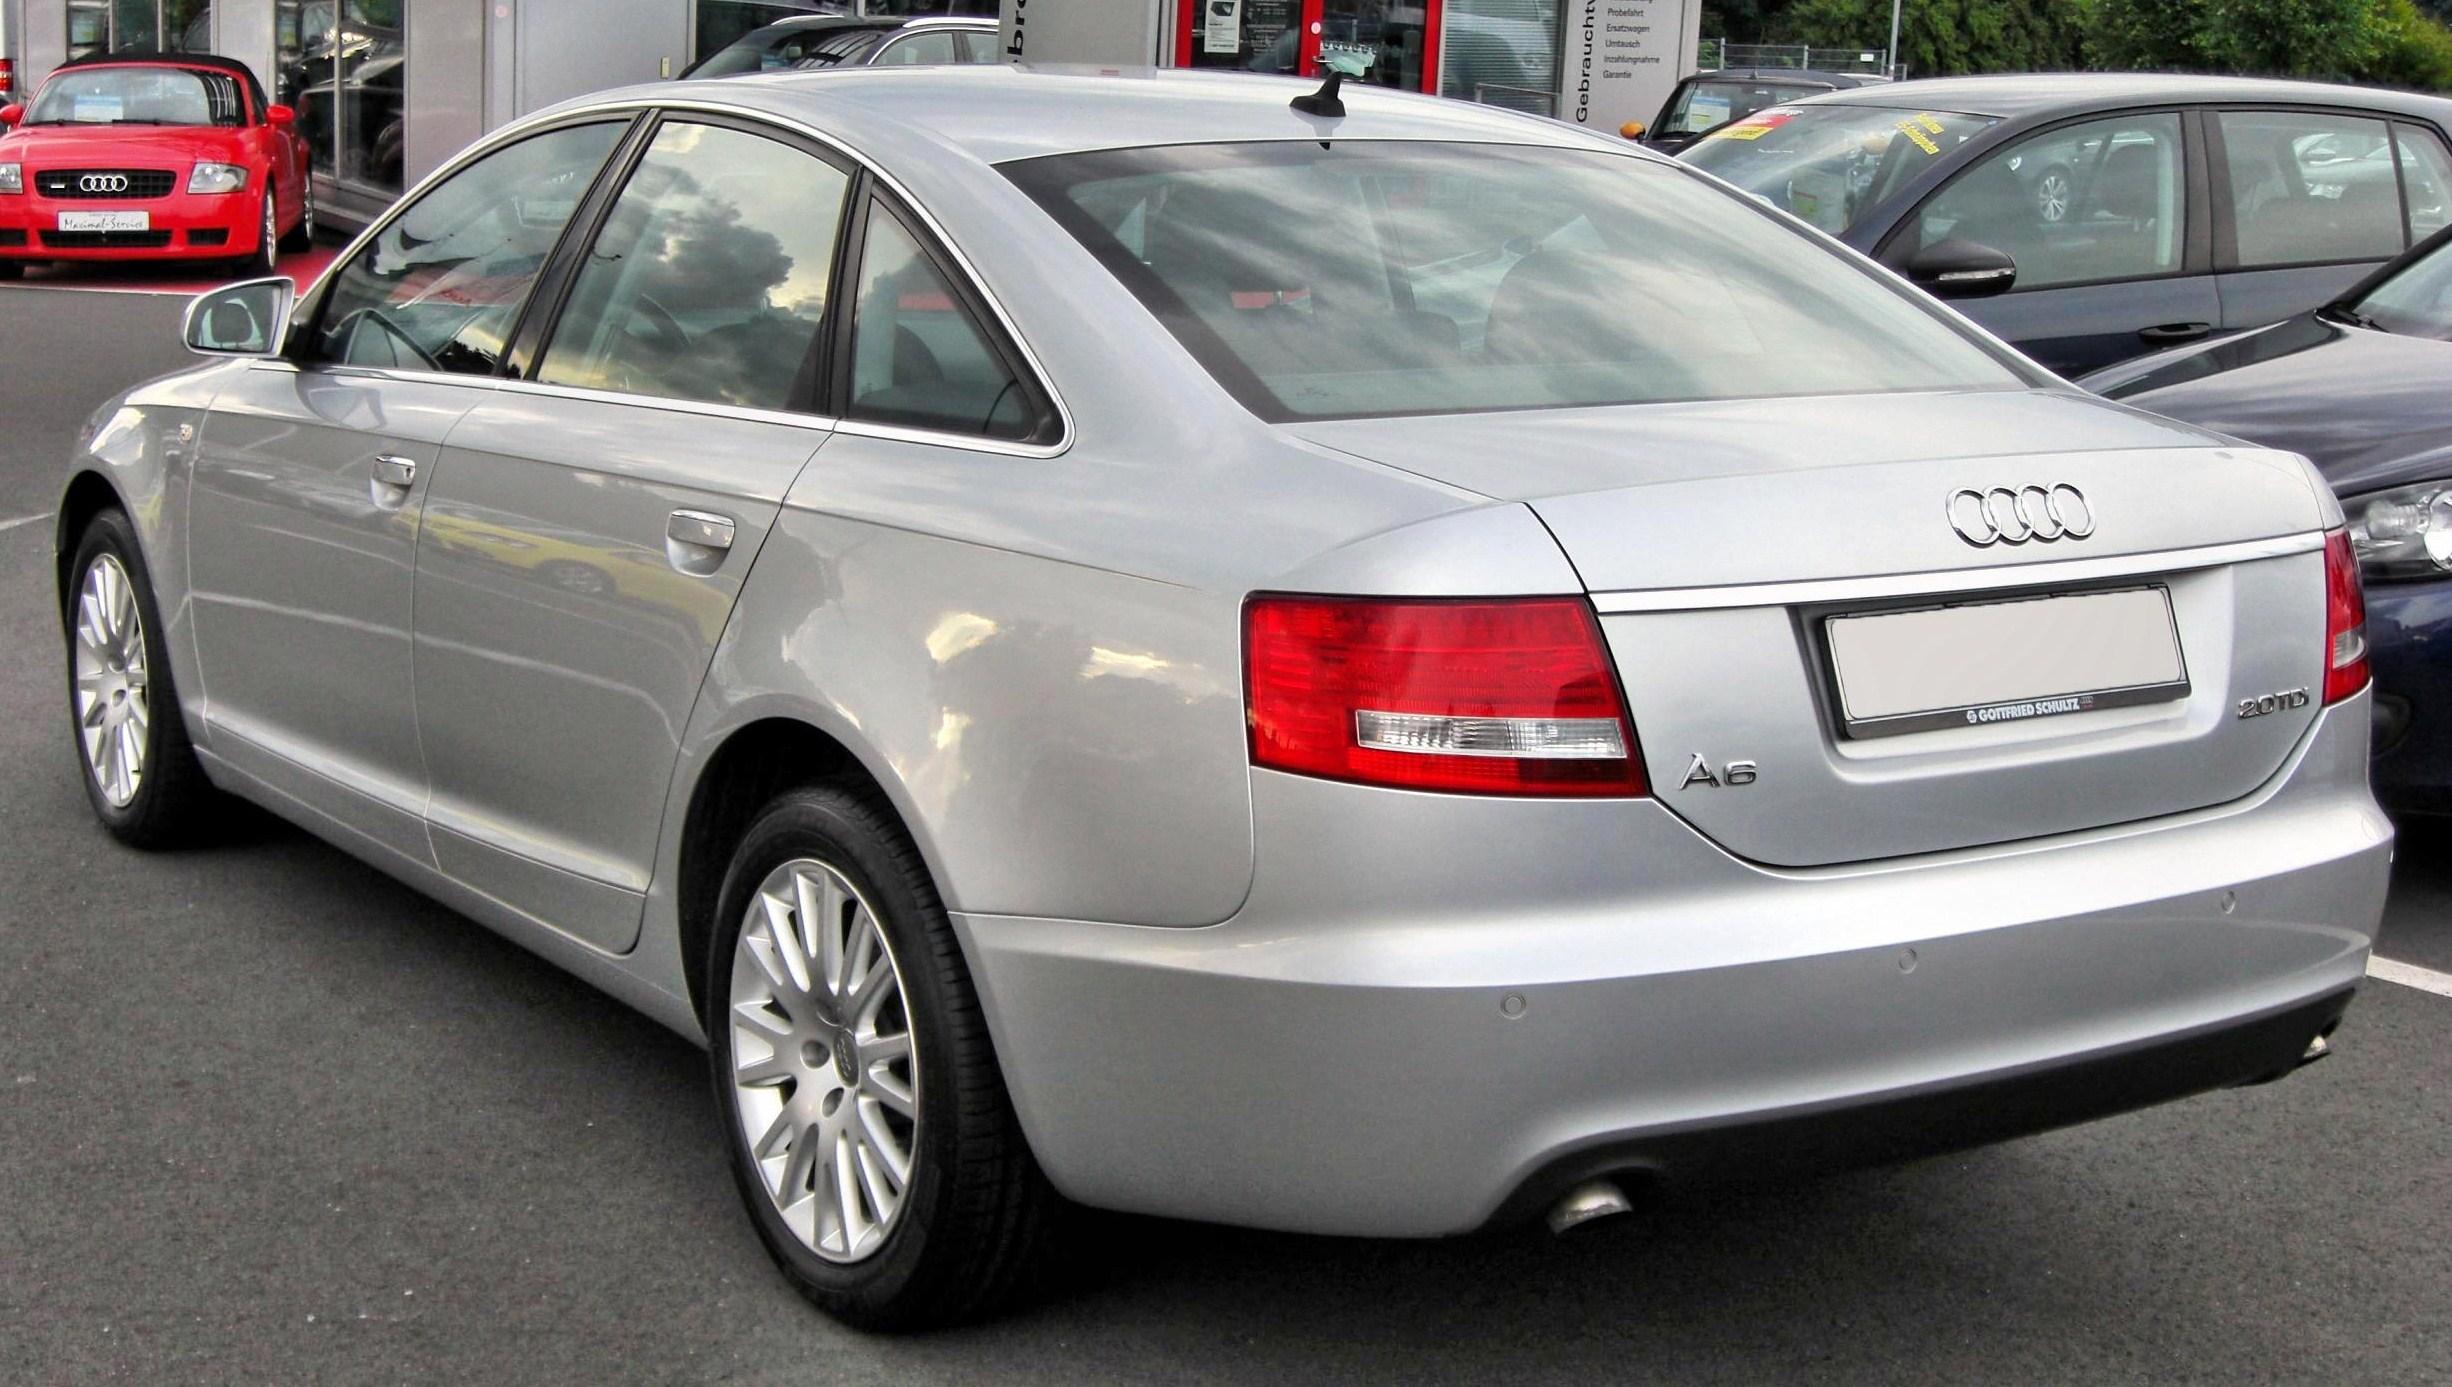 File Audi A6 C6 20090717 Rear Jpg Wikimedia Commons